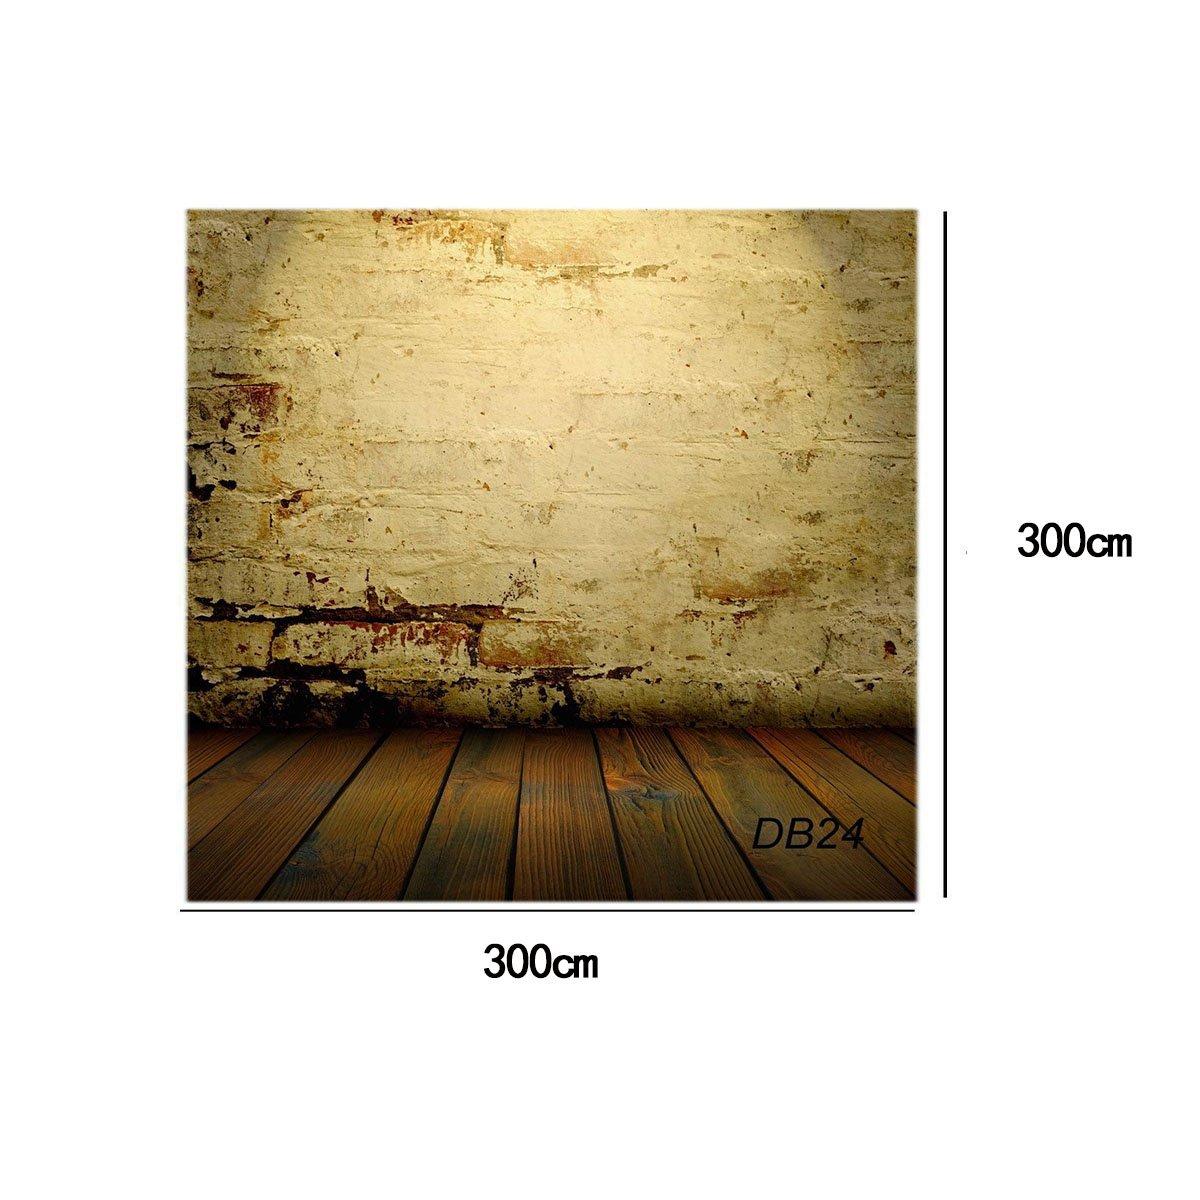 Amazon.com : 10X10ft Brick wall with wooden floor Vinyl Customized ...